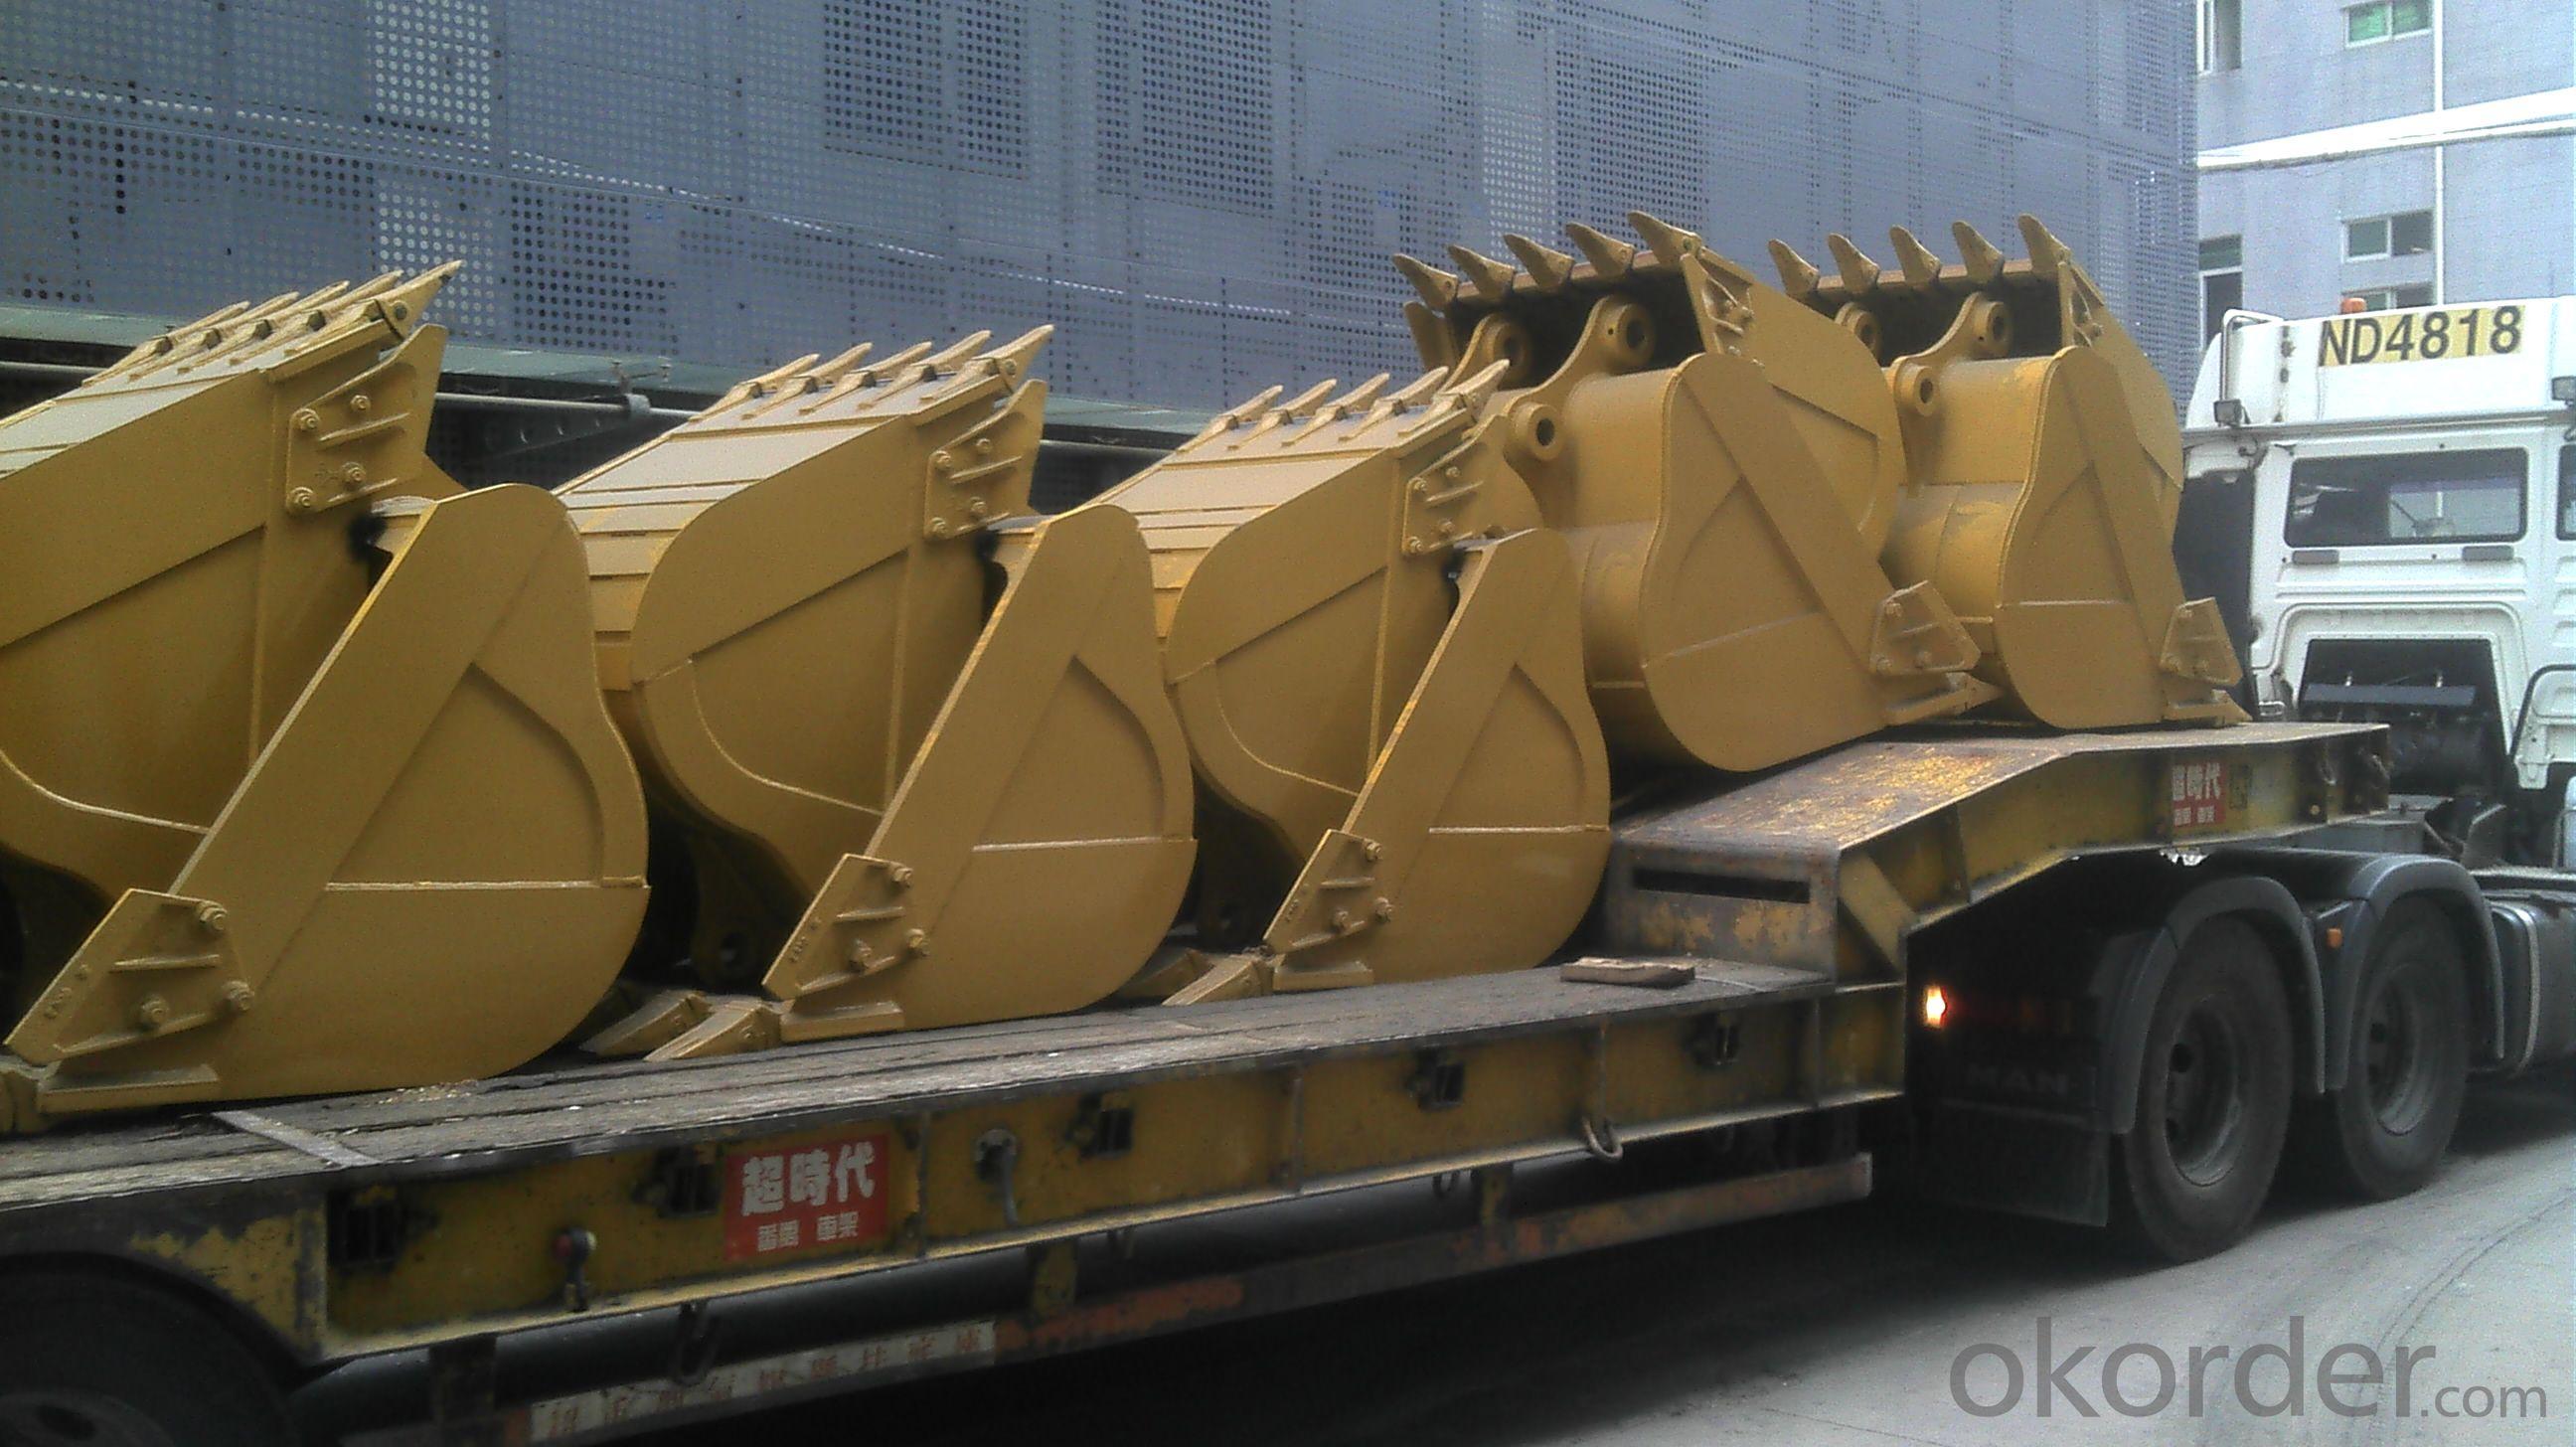 KOMATSU excavator Bucket excavator parts